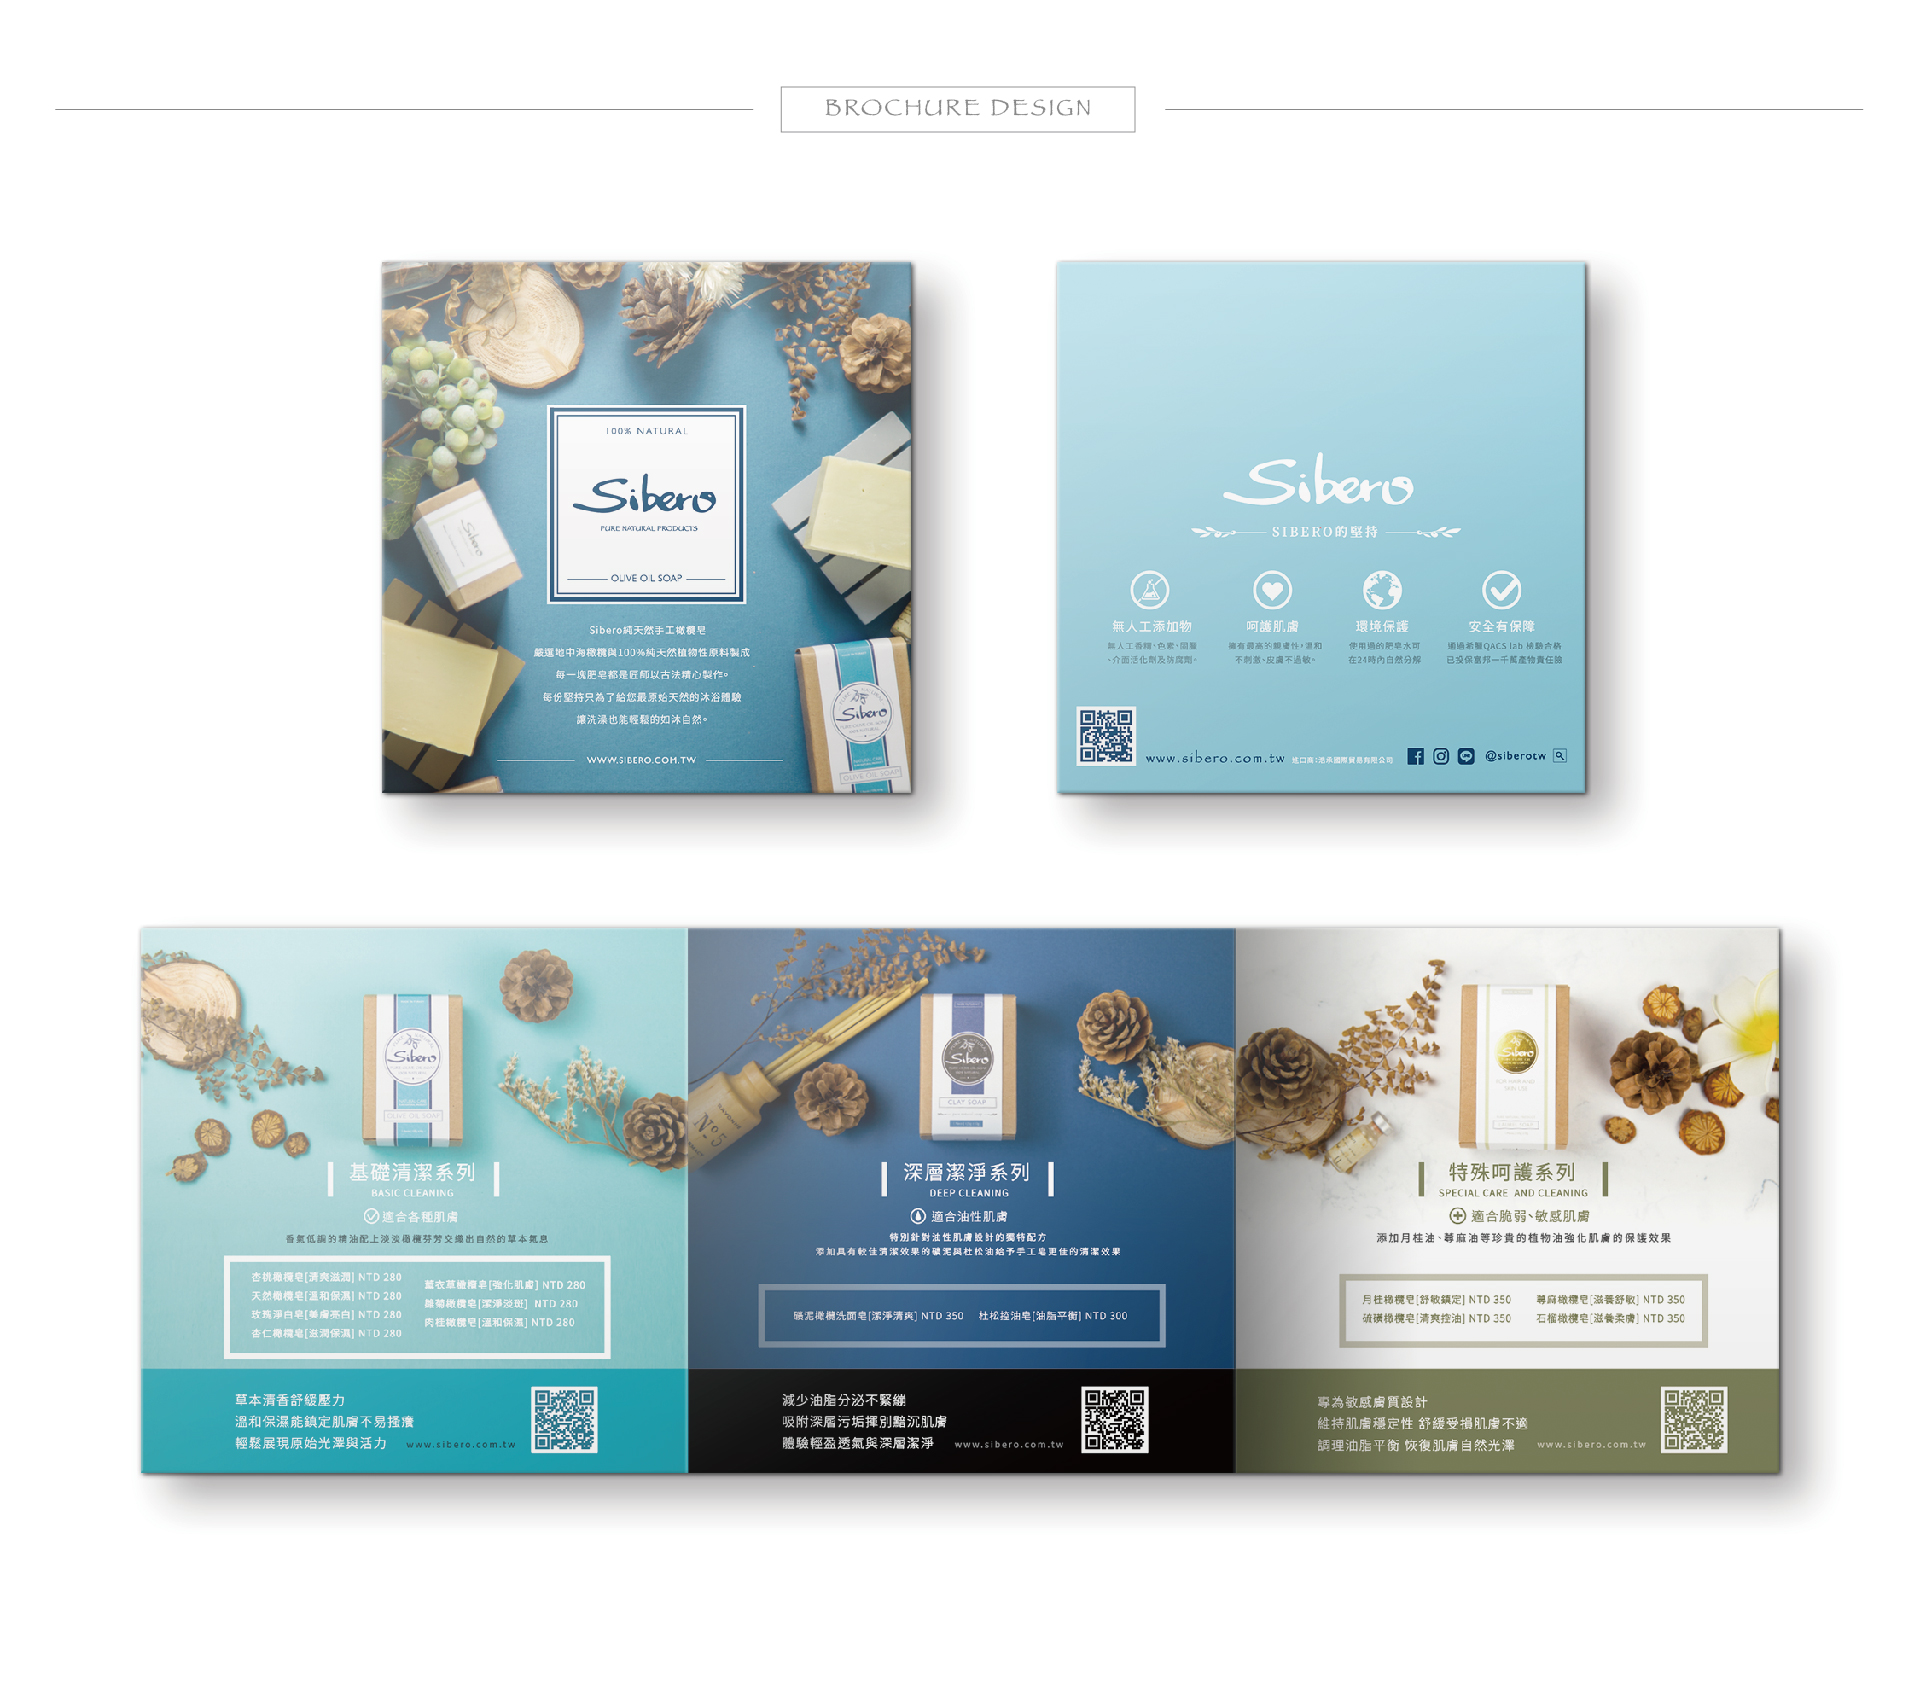 handmade soap, logo design, brochure design